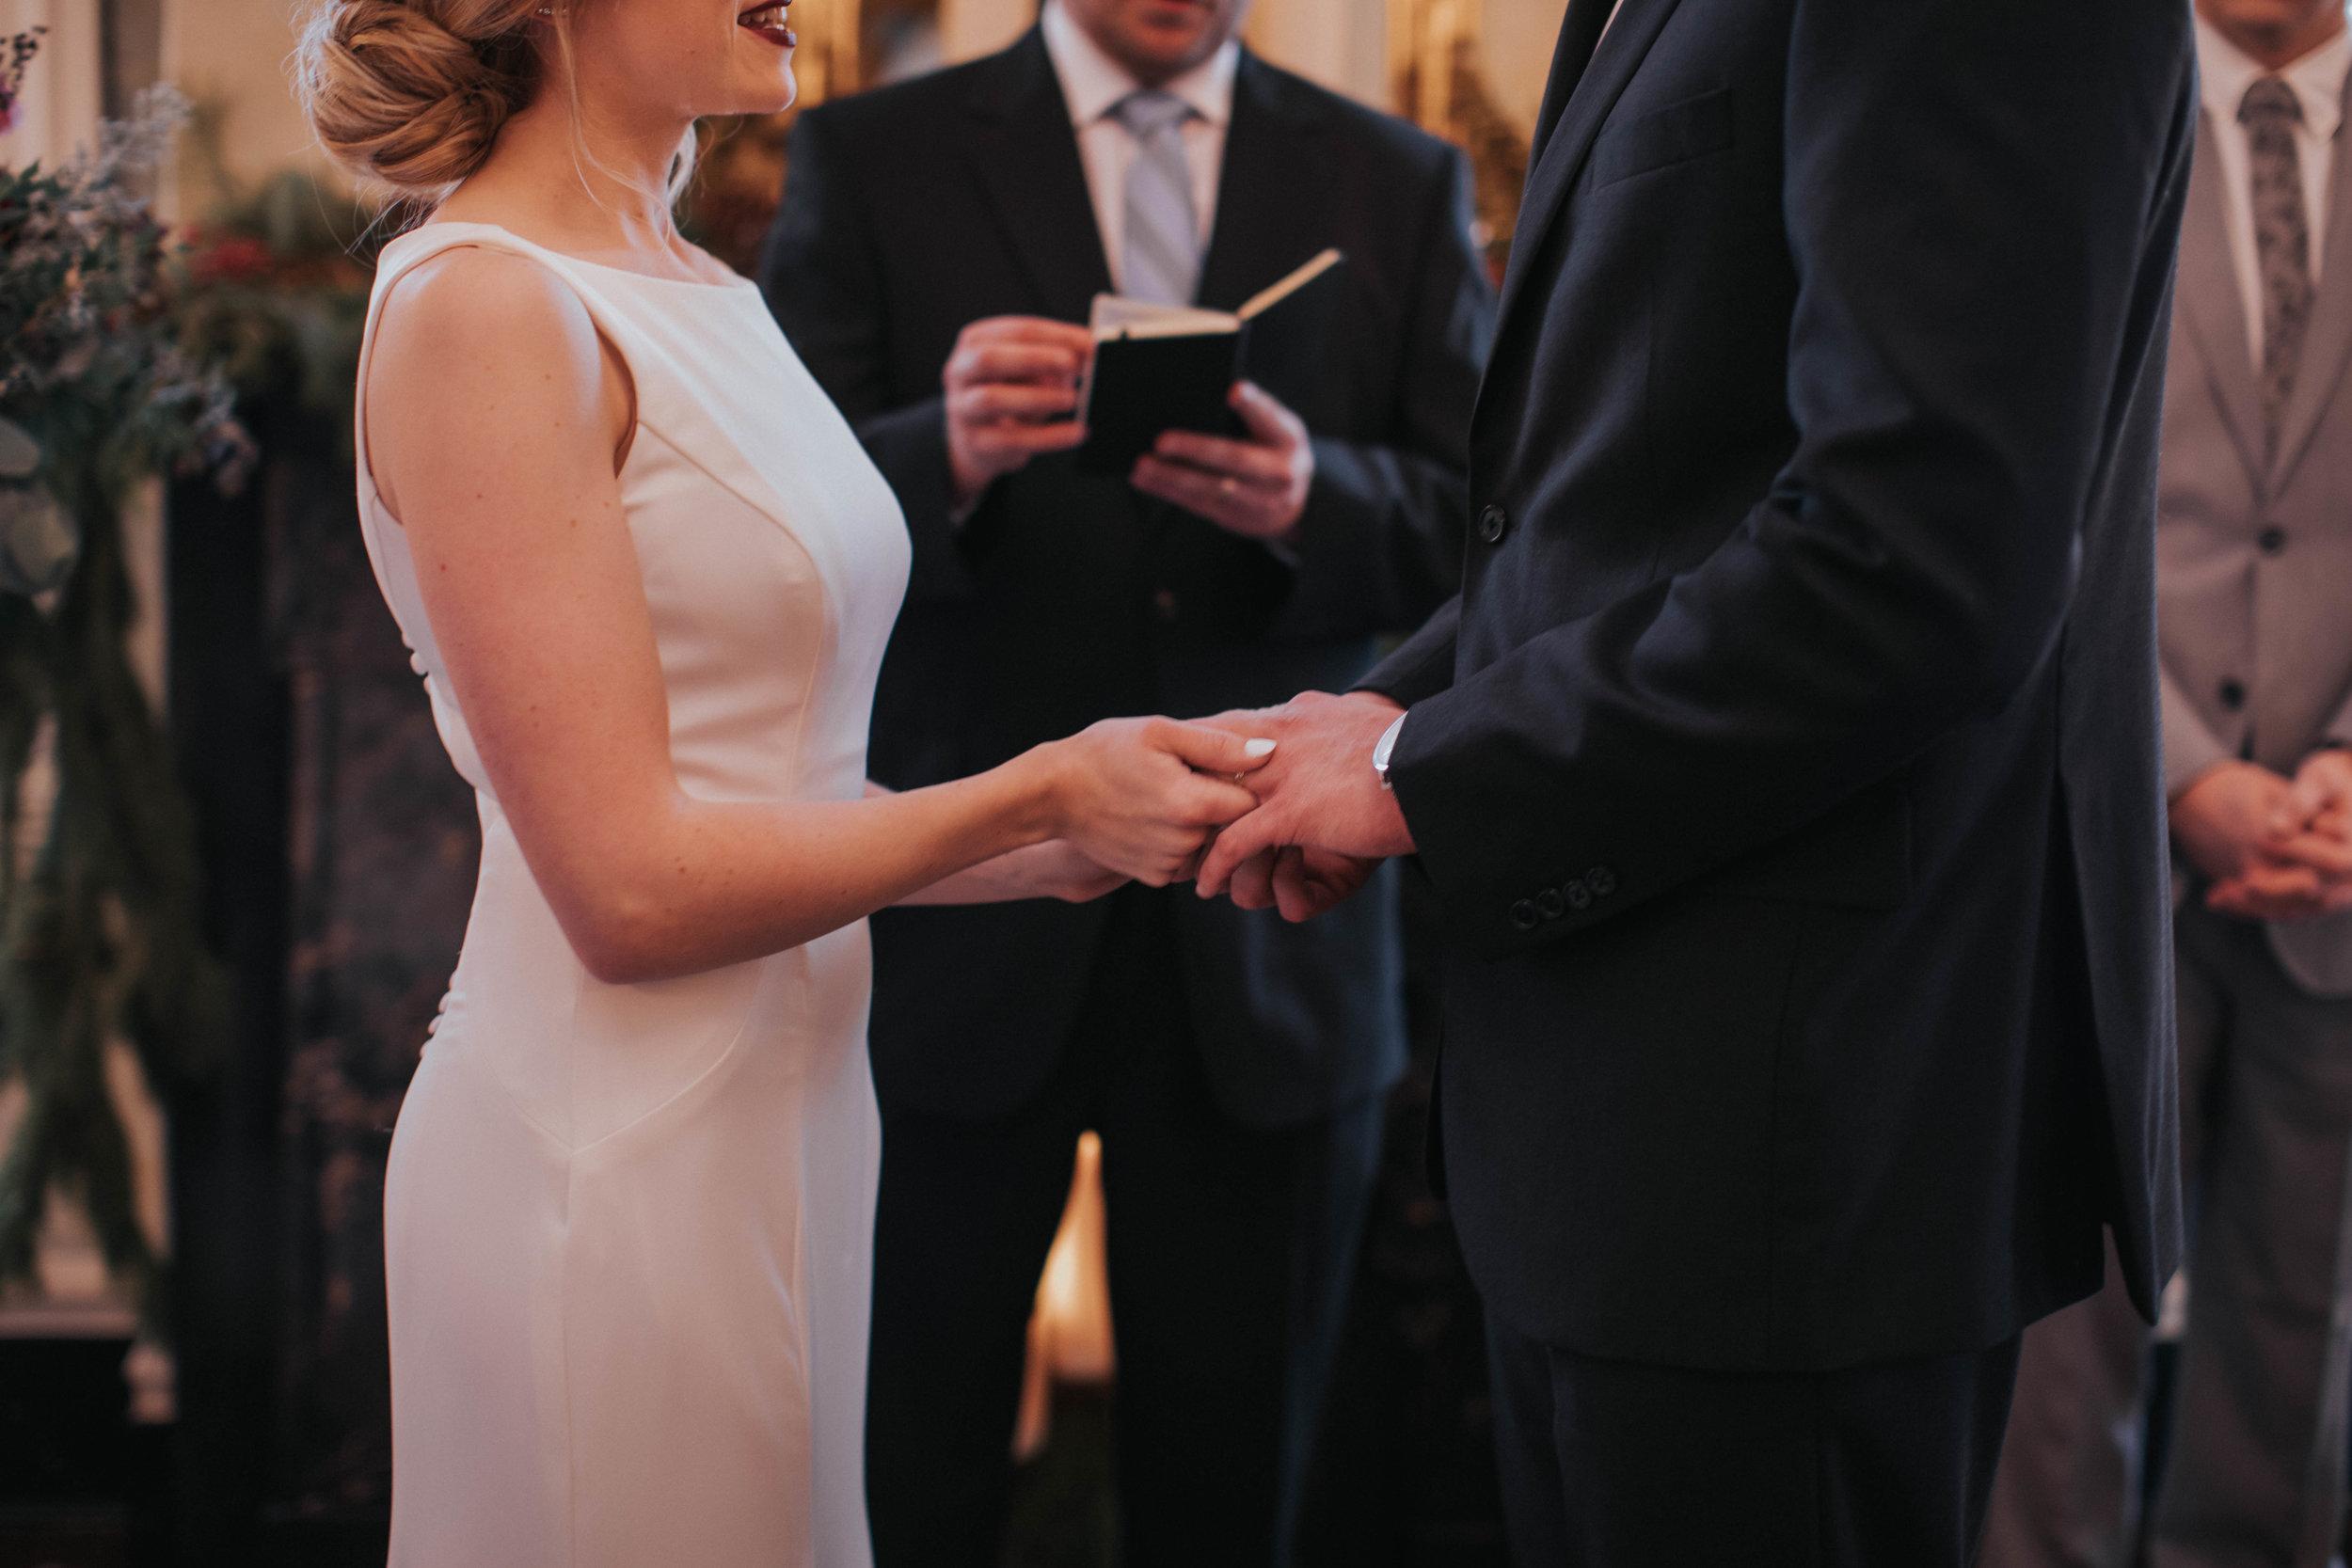 Charis_Lauren_Romantic_Wedding_Photographer_Nashville_03A1438.jpg